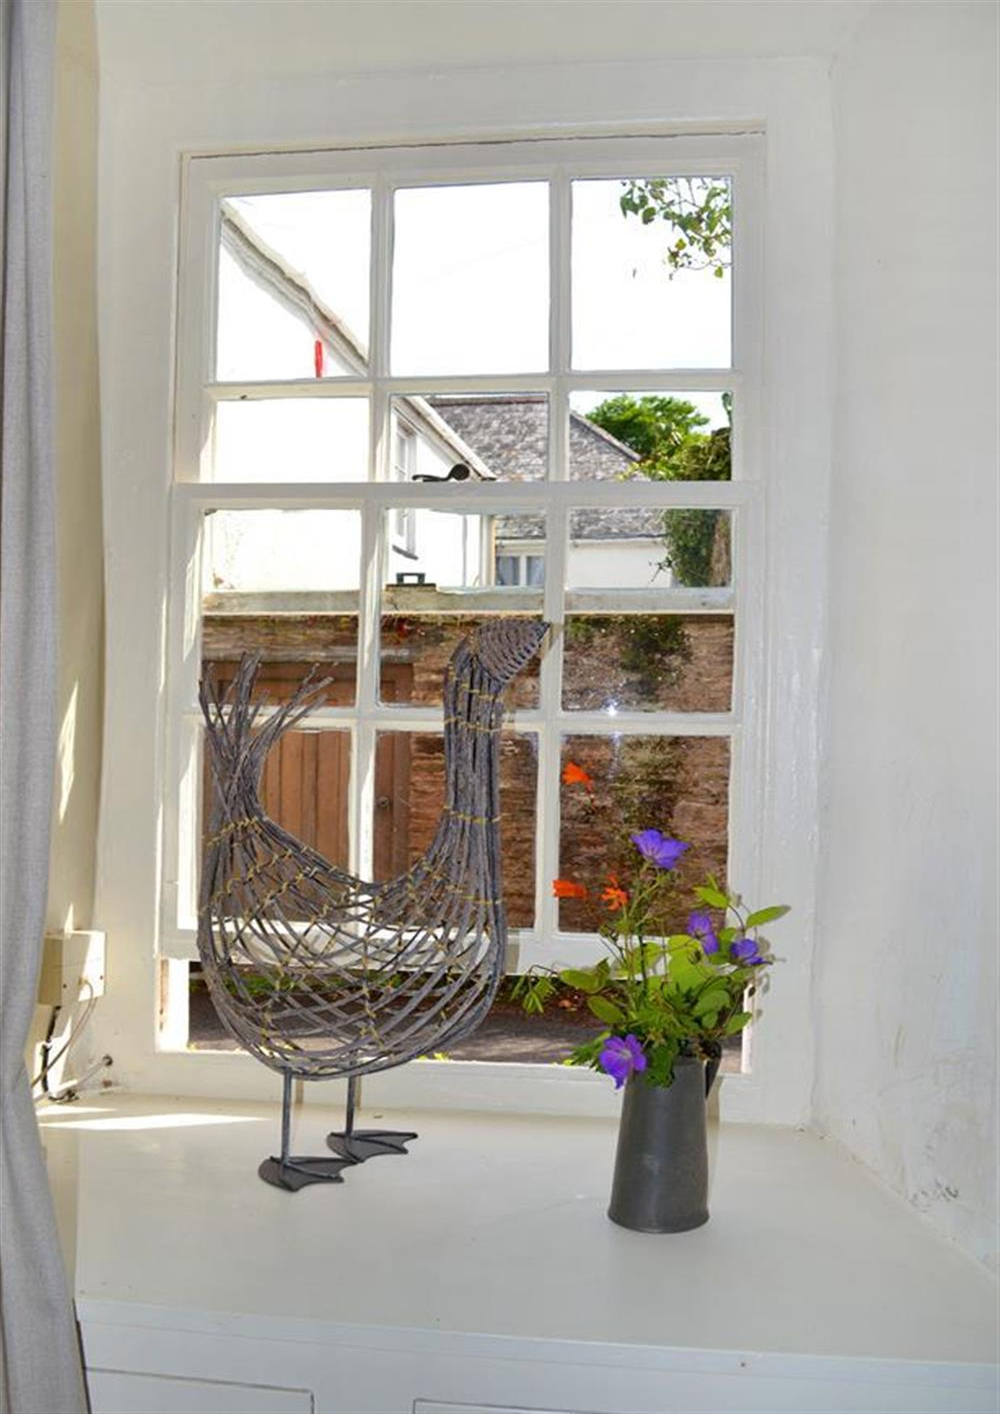 A window detail at 2 Vale Cottage, Slapton